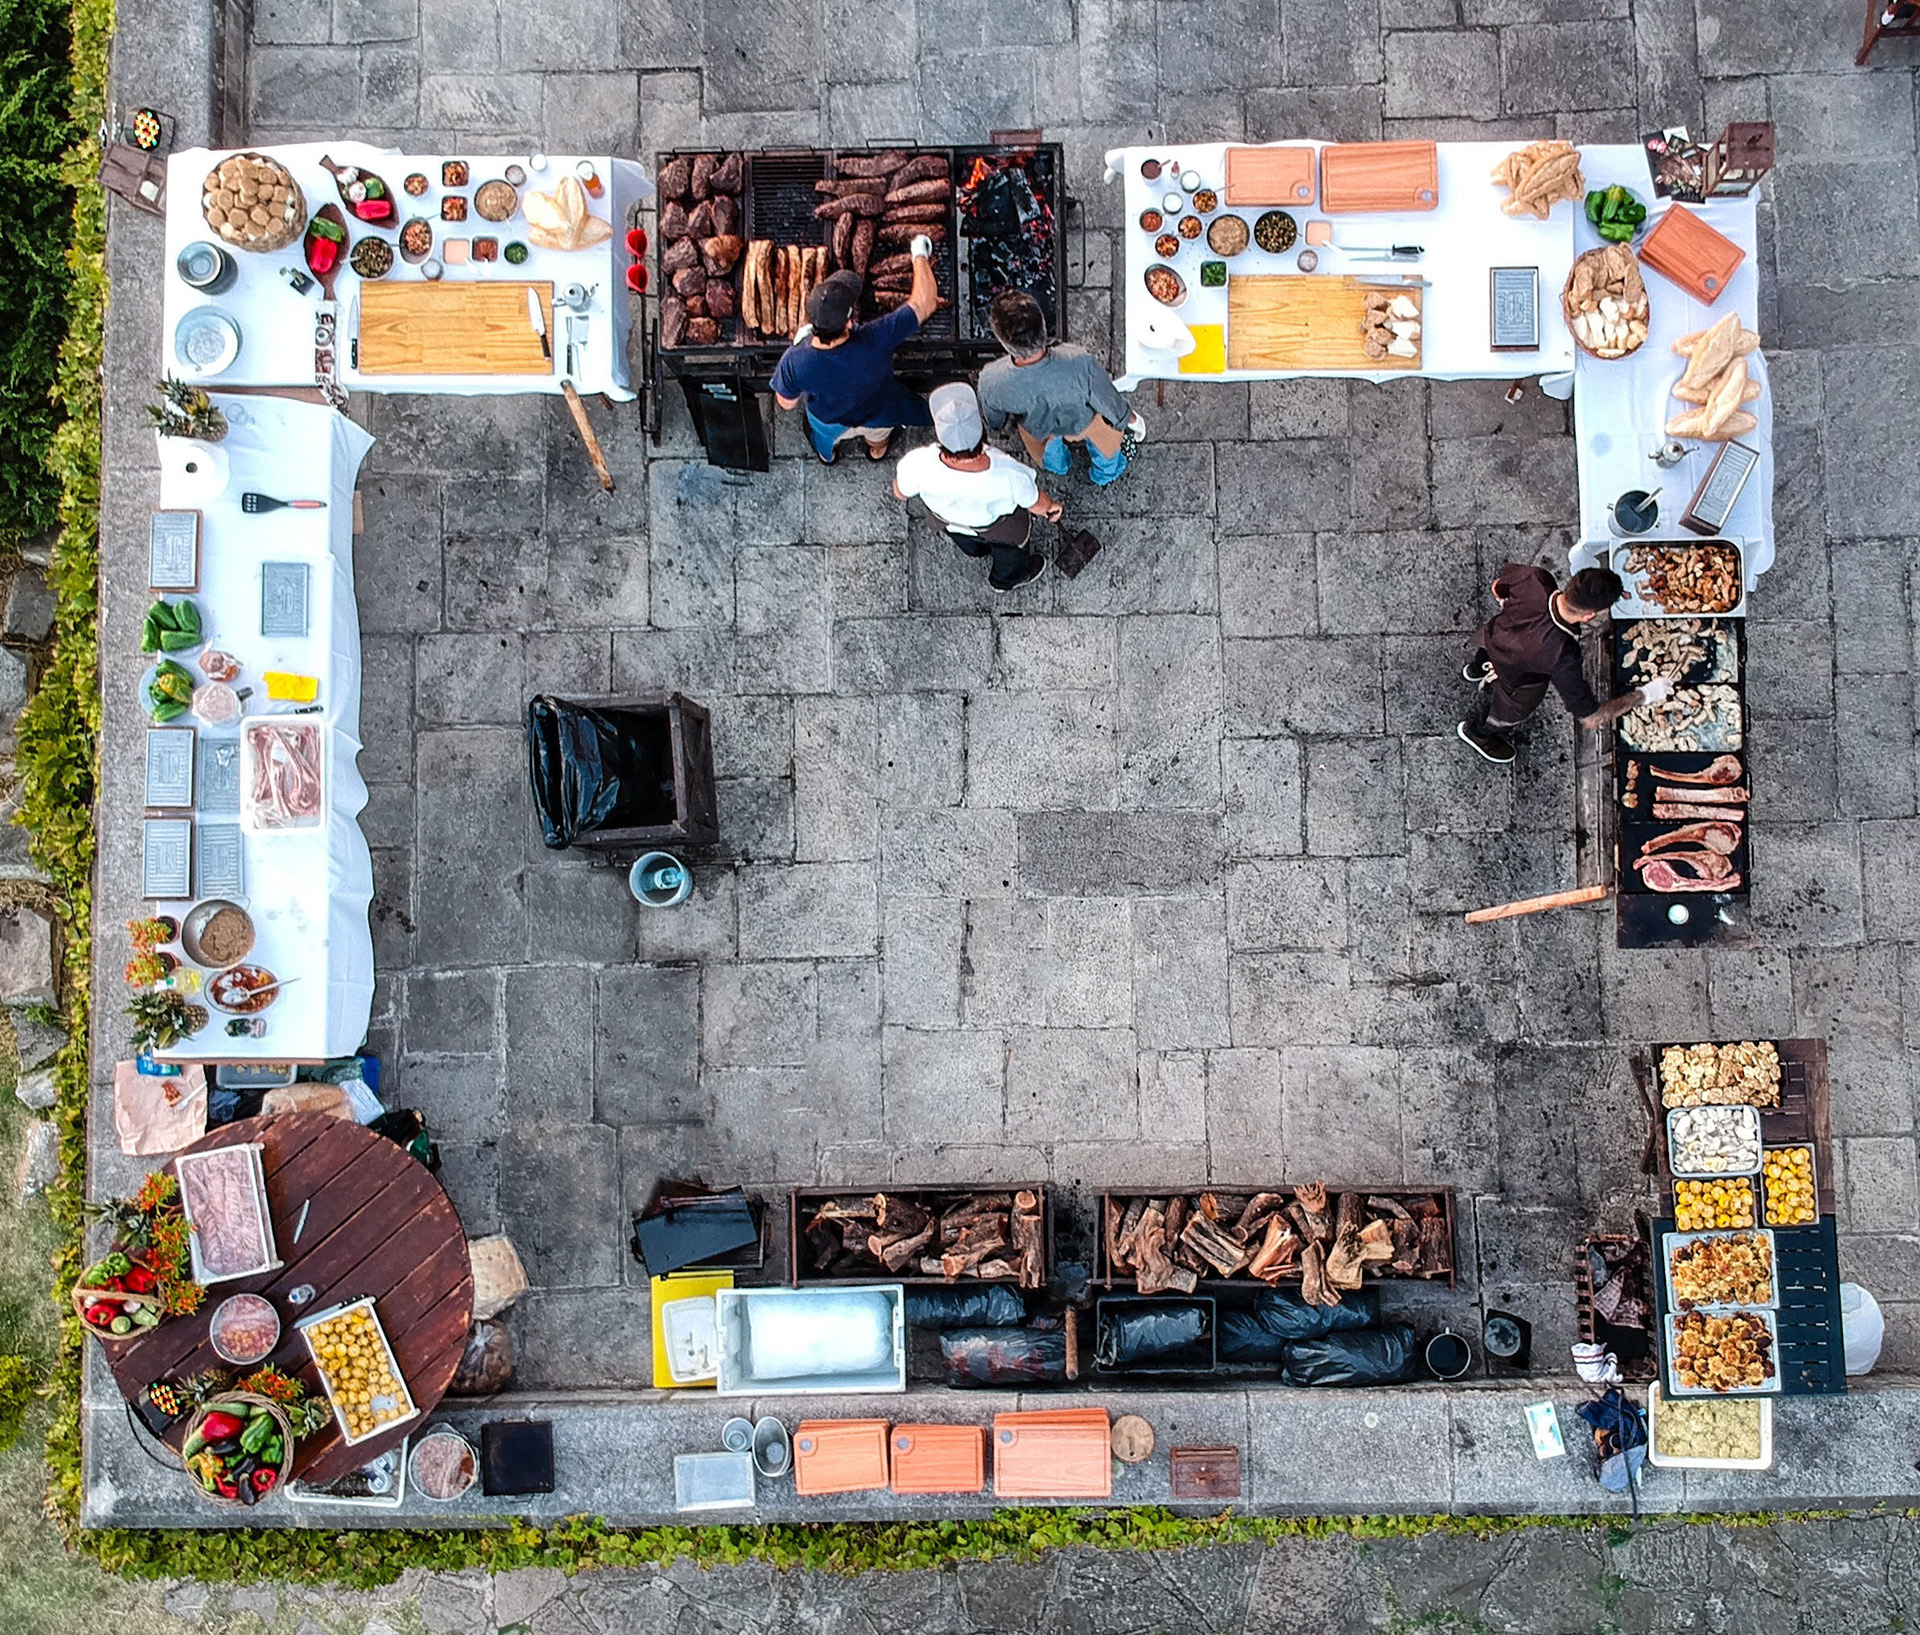 Cocina de fuegos con carnes deCabaña Juramento